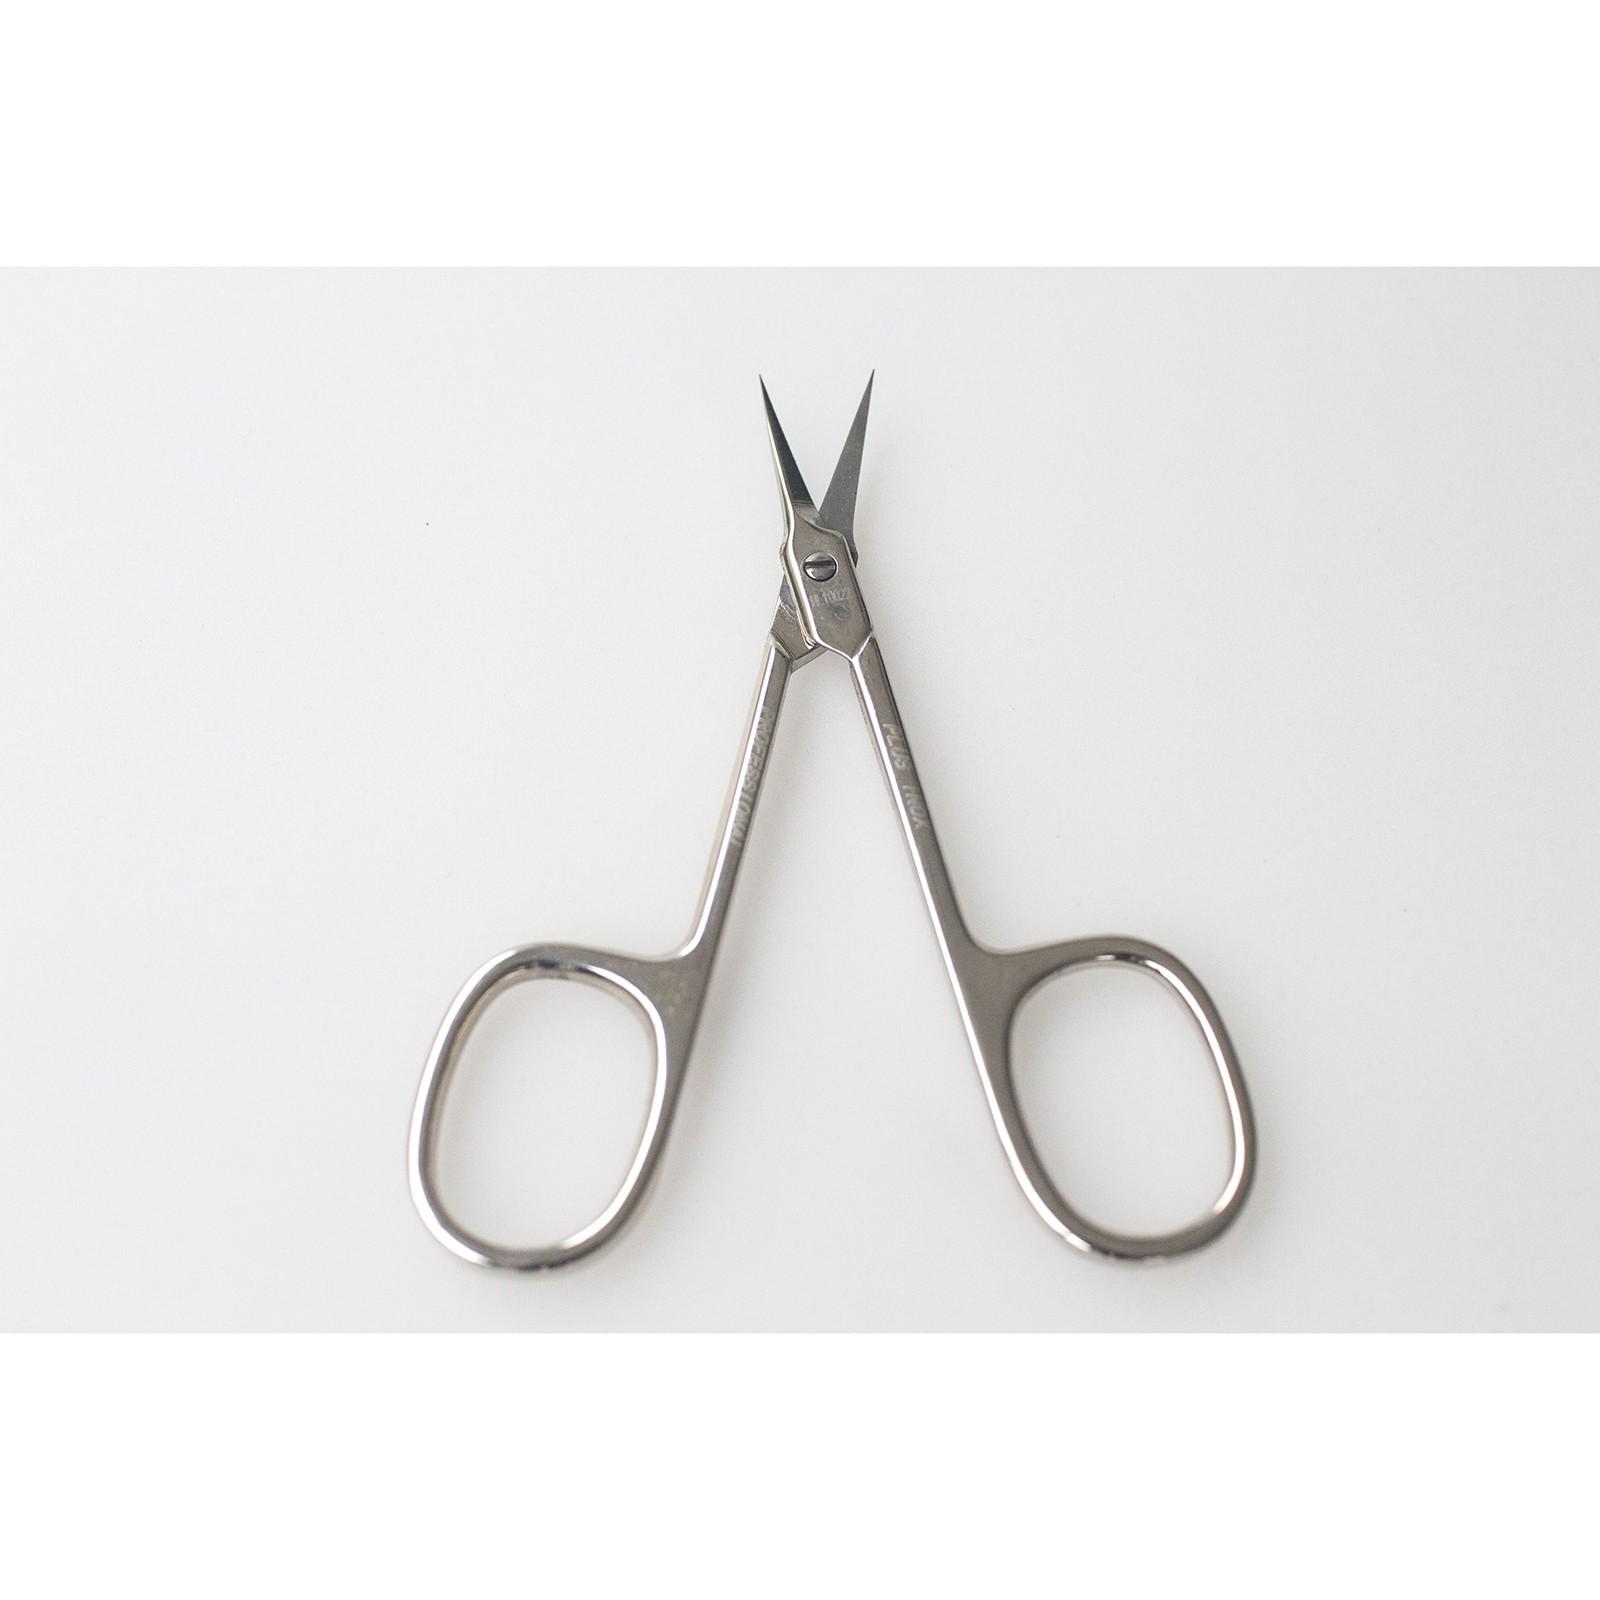 Маникюрные ножницы Lombard Cutlery HL10022 victoria cross anna lombard